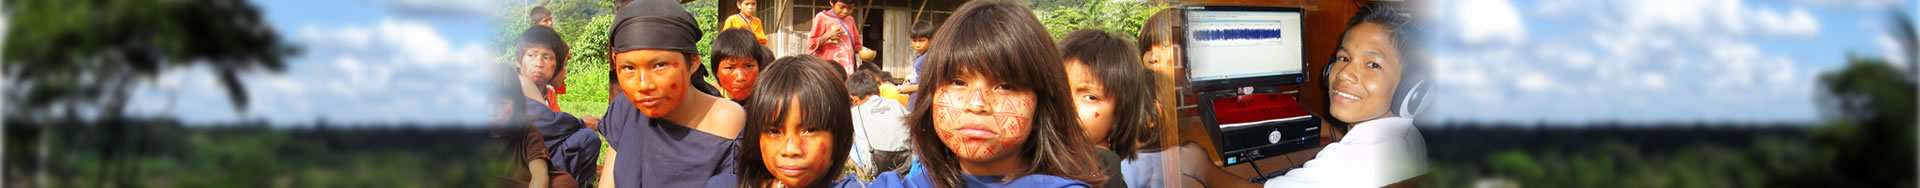 EDUC AMAZONIA